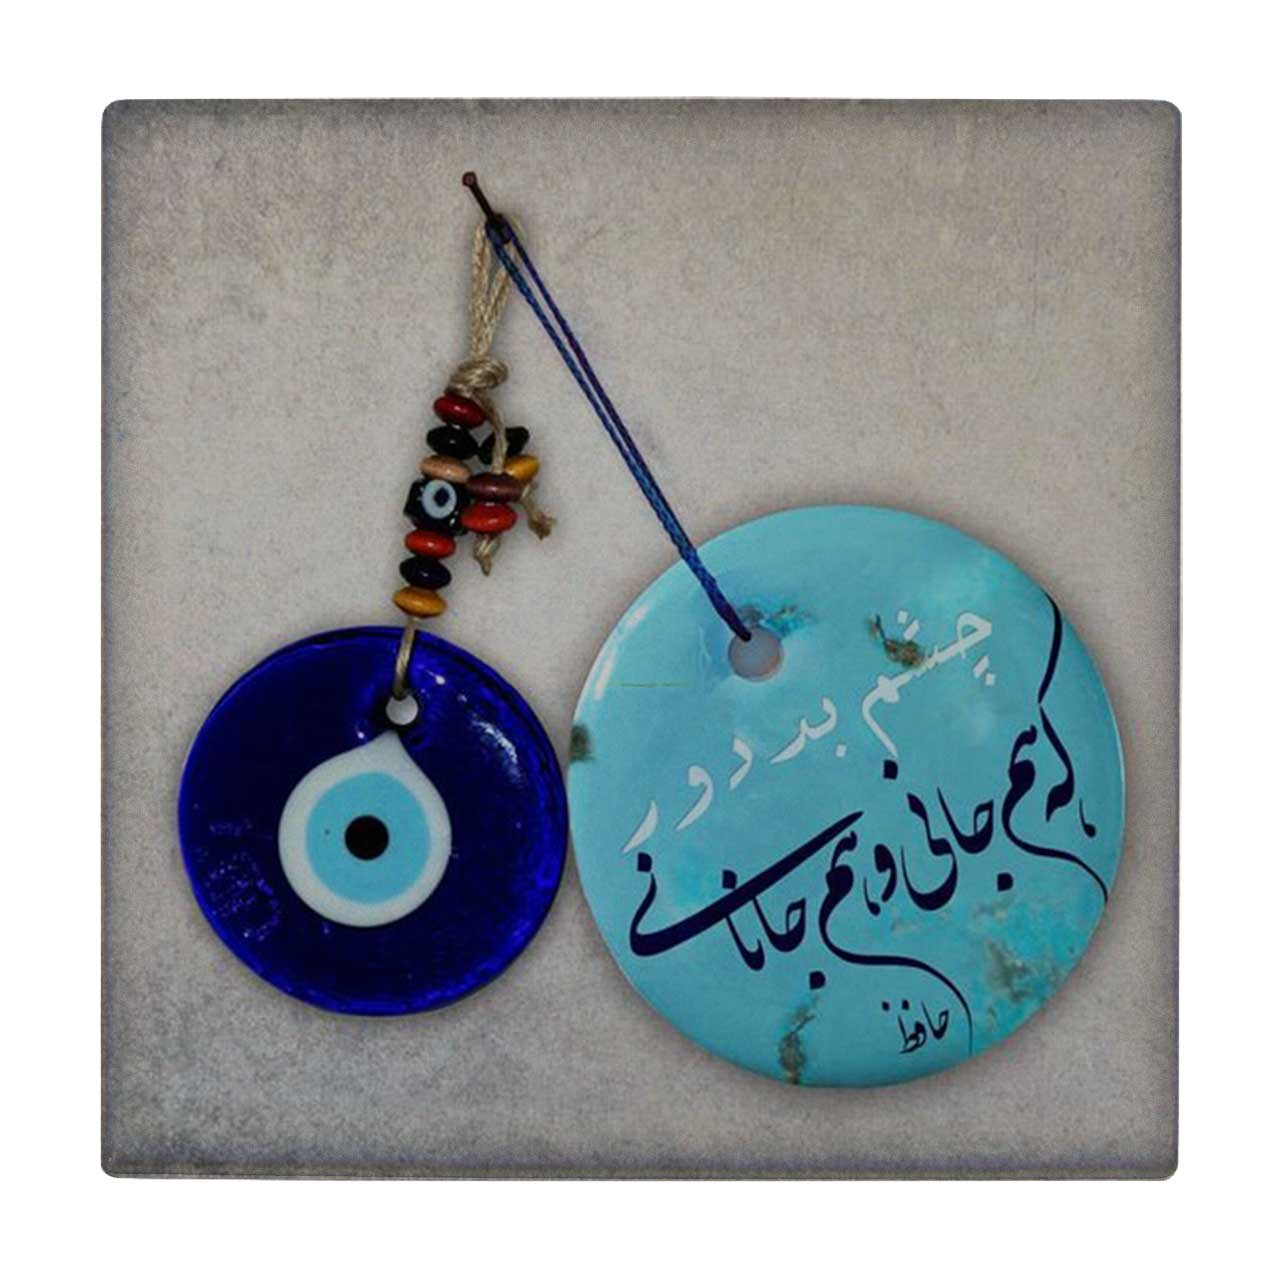 کاشی طرح چشم نظر و شعر حافظ کد wk1496